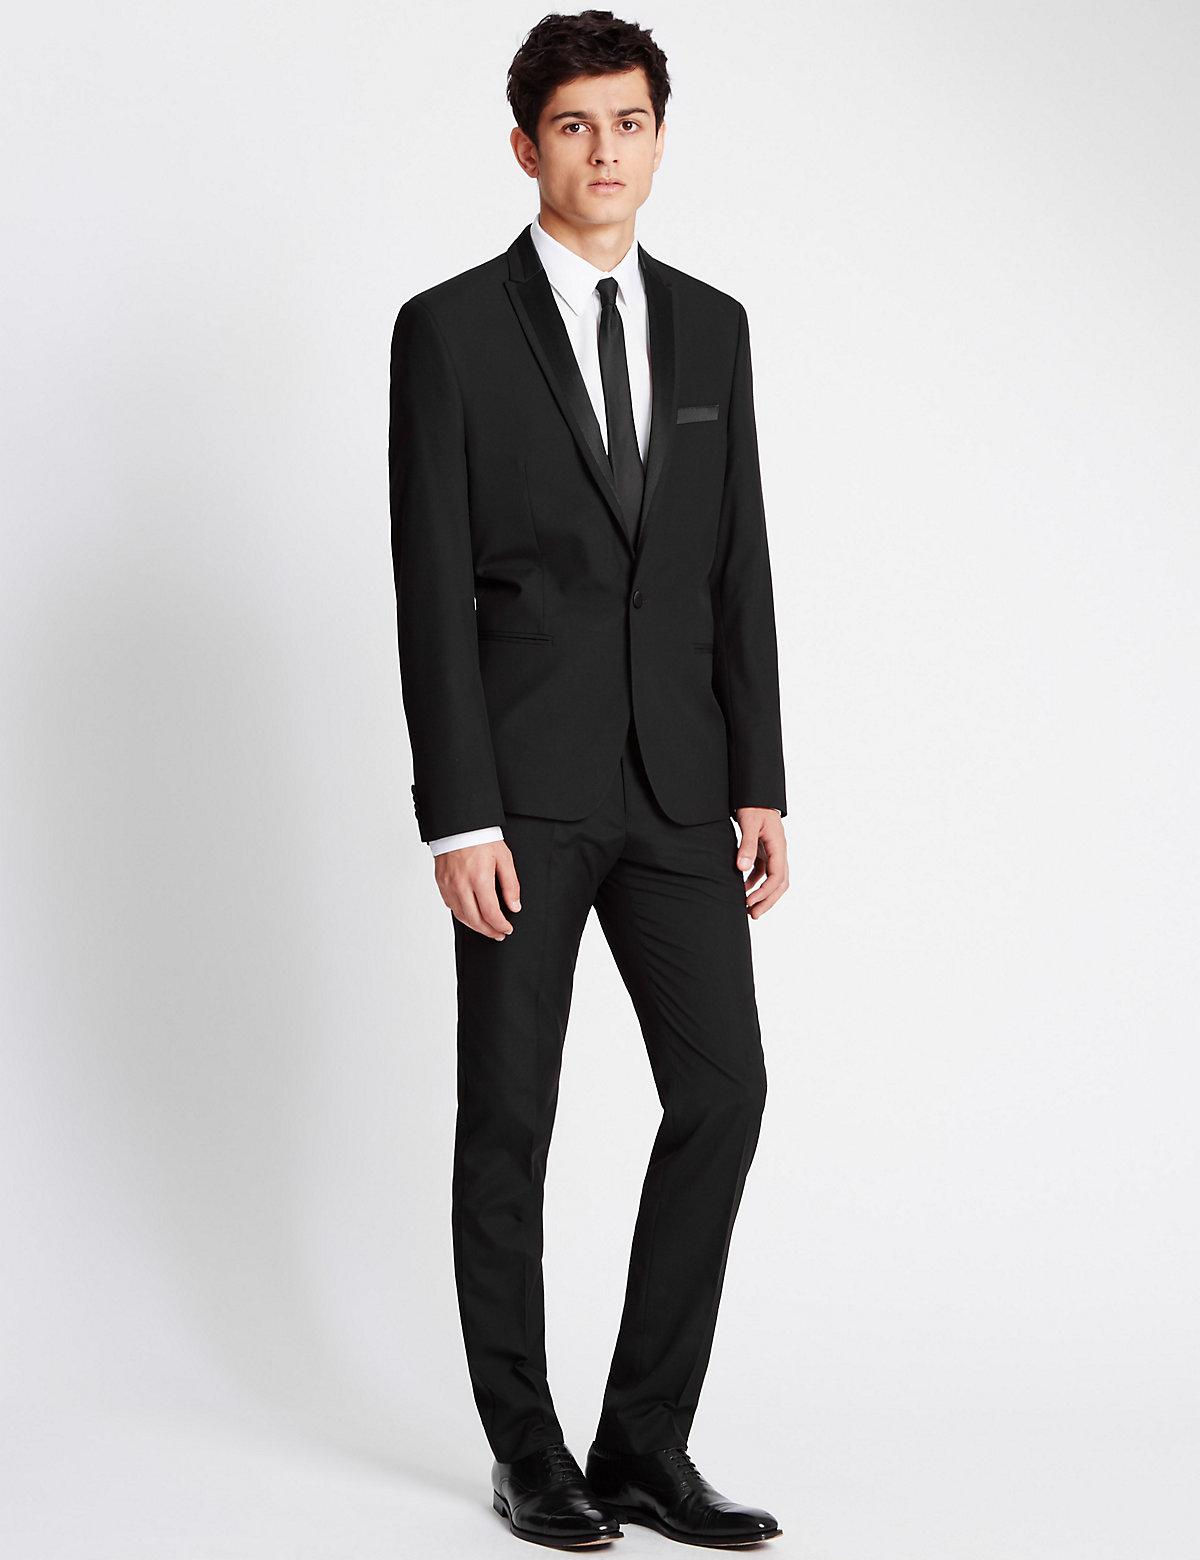 Limited Edition Super Slim Fit Peak Lapel 1 Button Eveningwear Jacket £55.00 AT vintagedancer.com